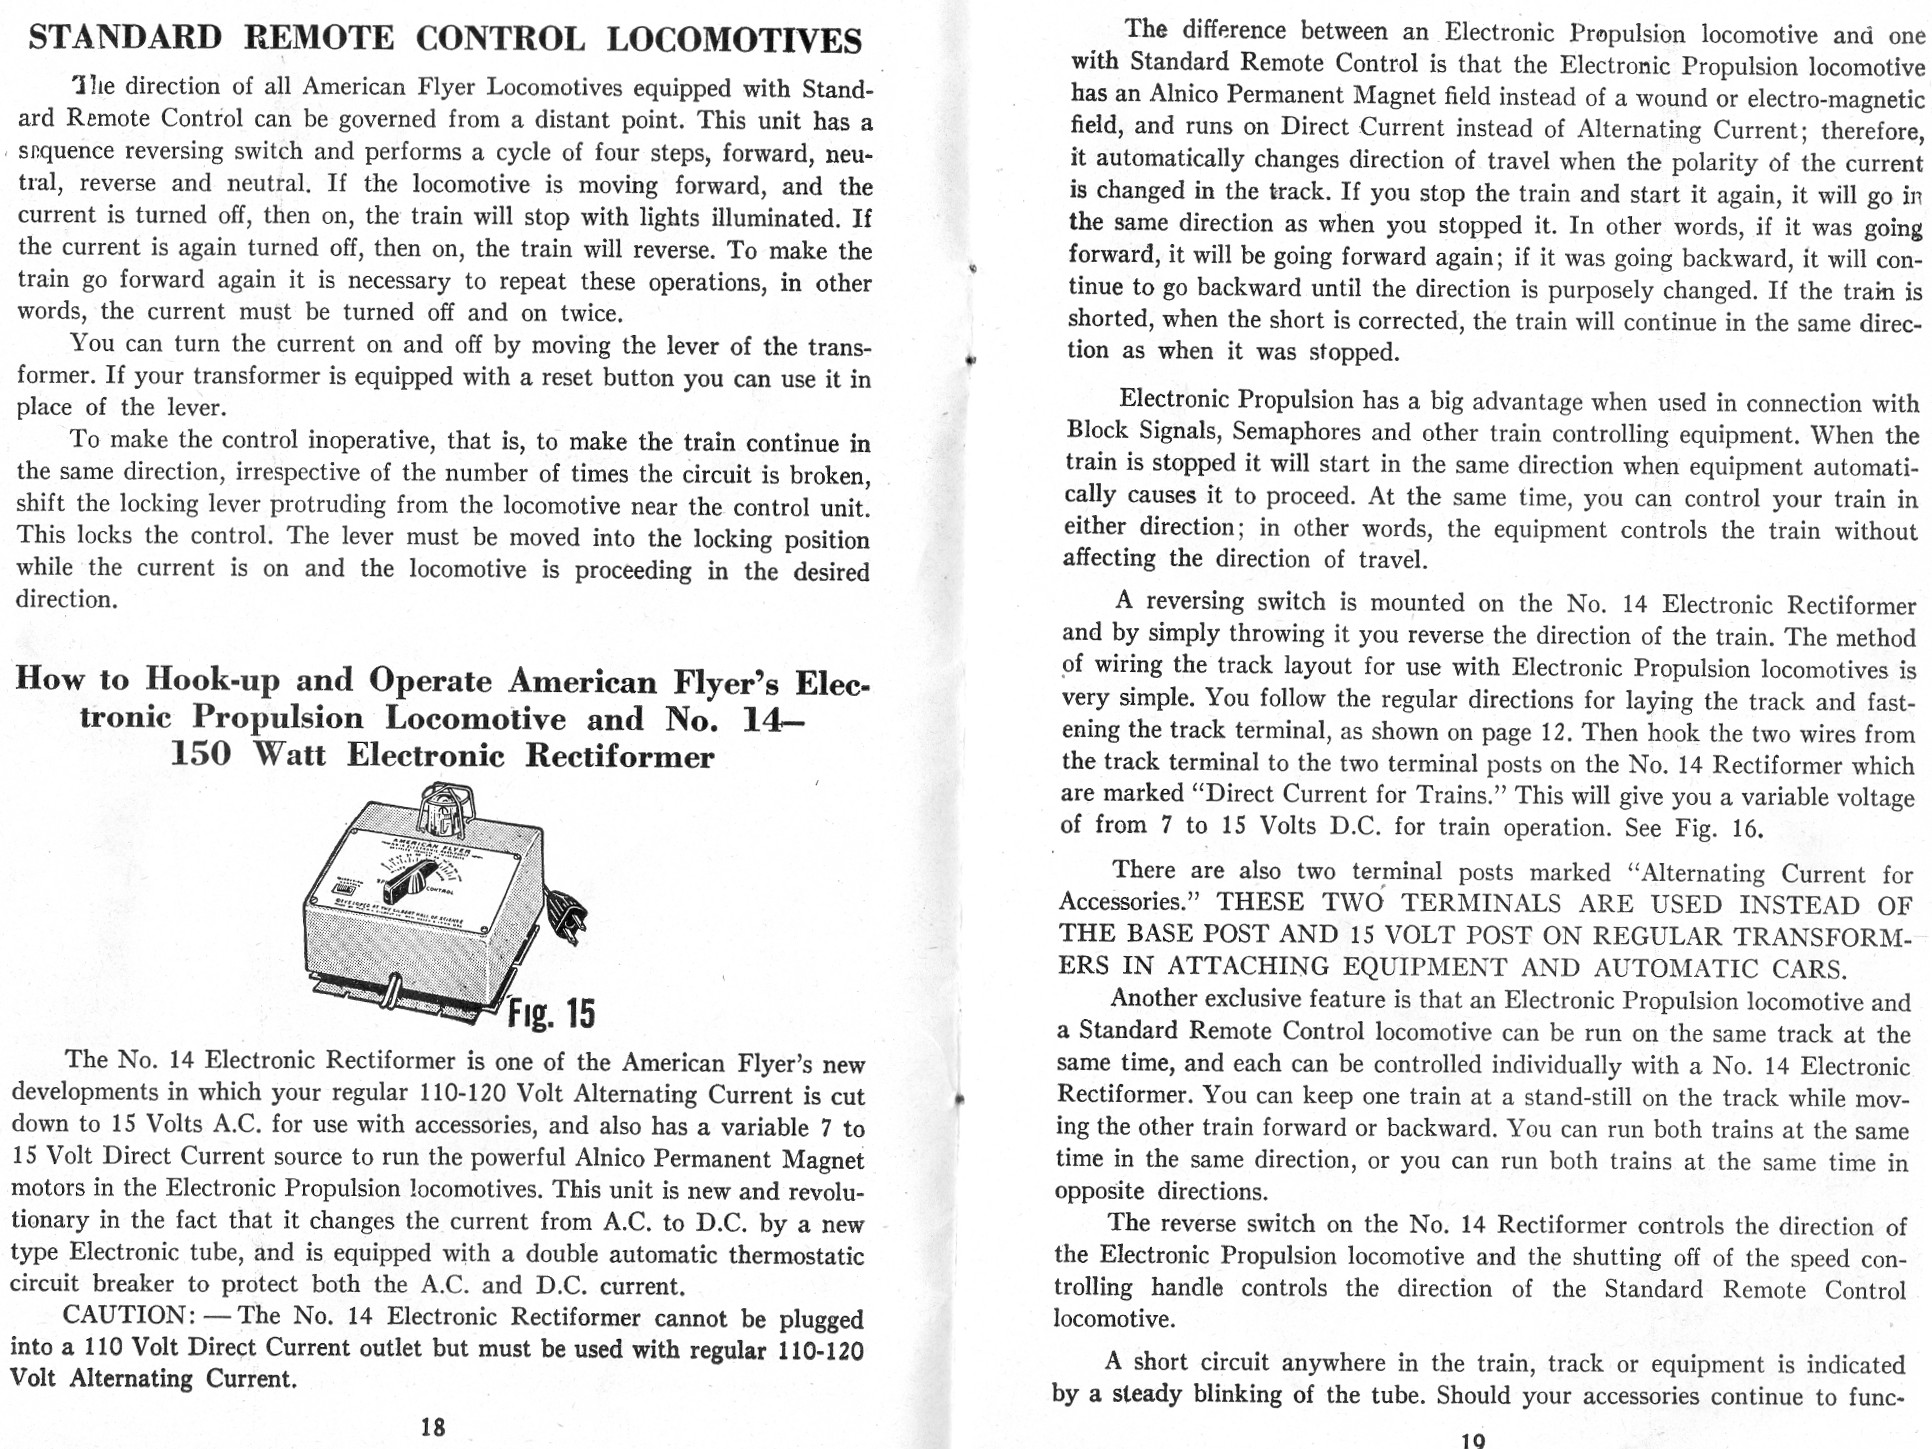 Standard Remote Control Locomotives